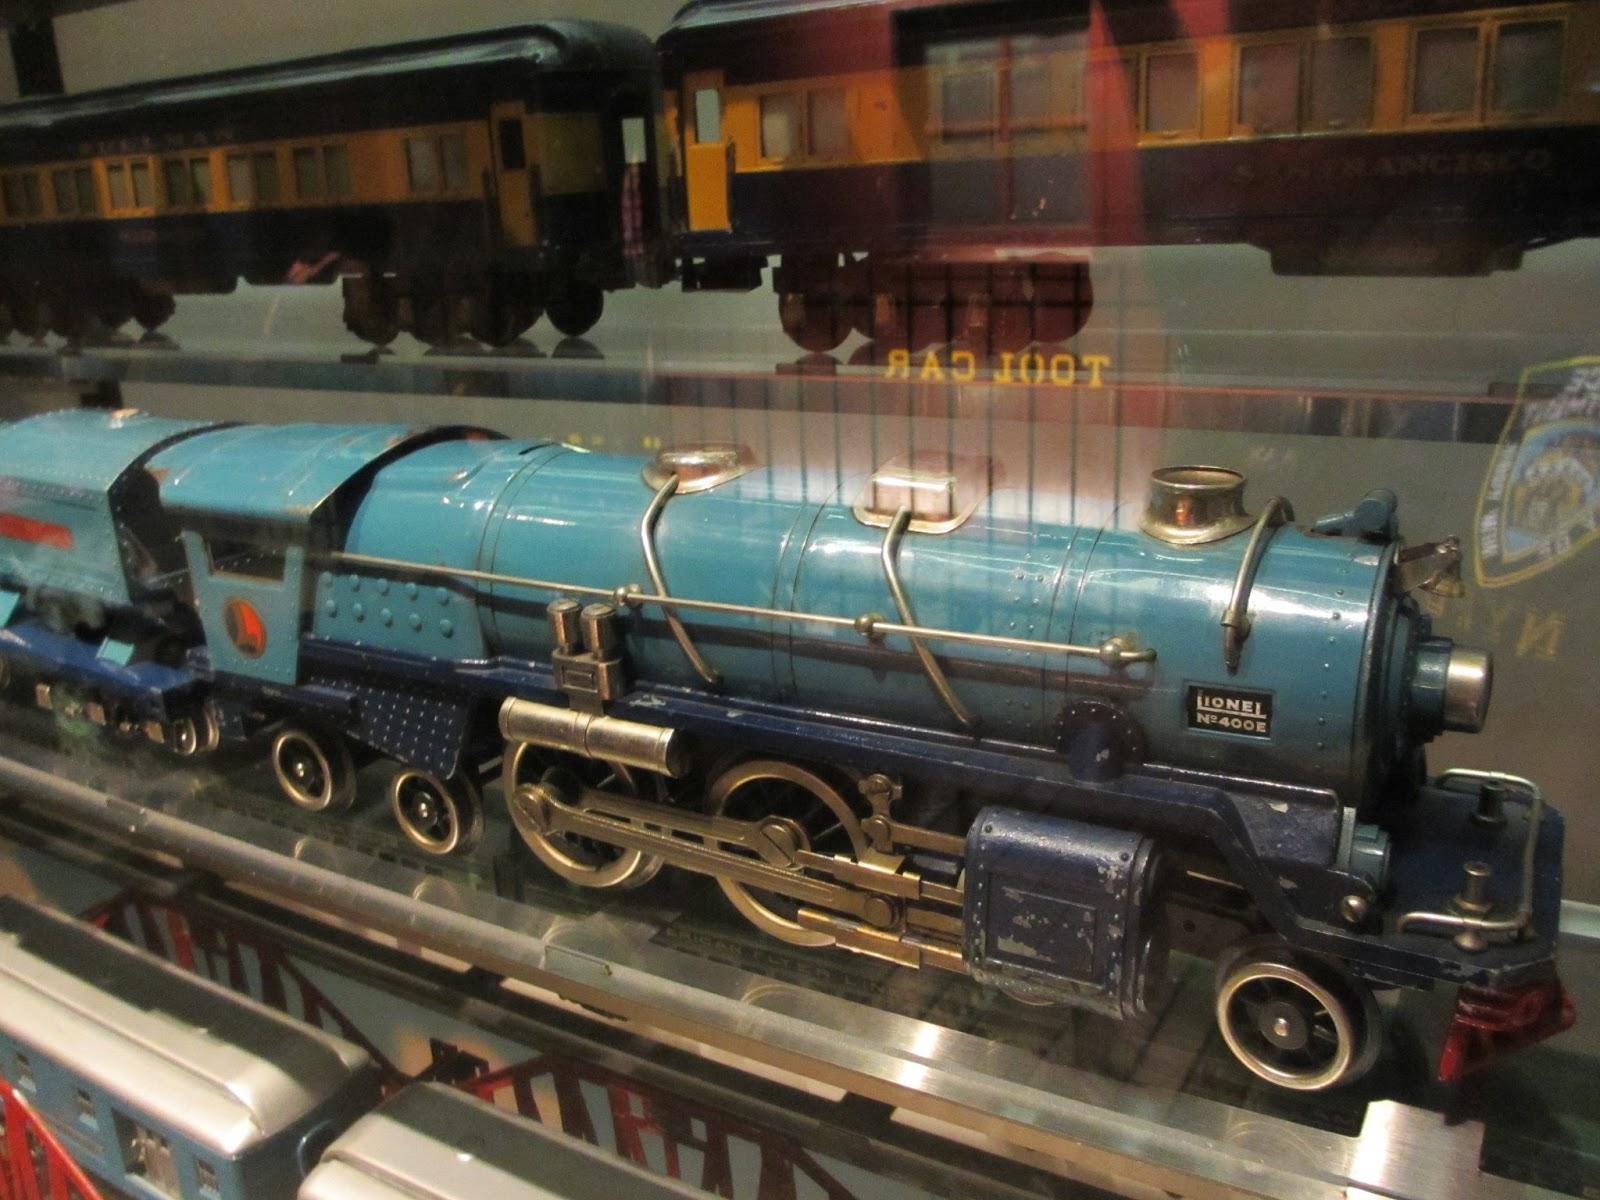 Lgb Trains For Sale Craigslist - Train Model